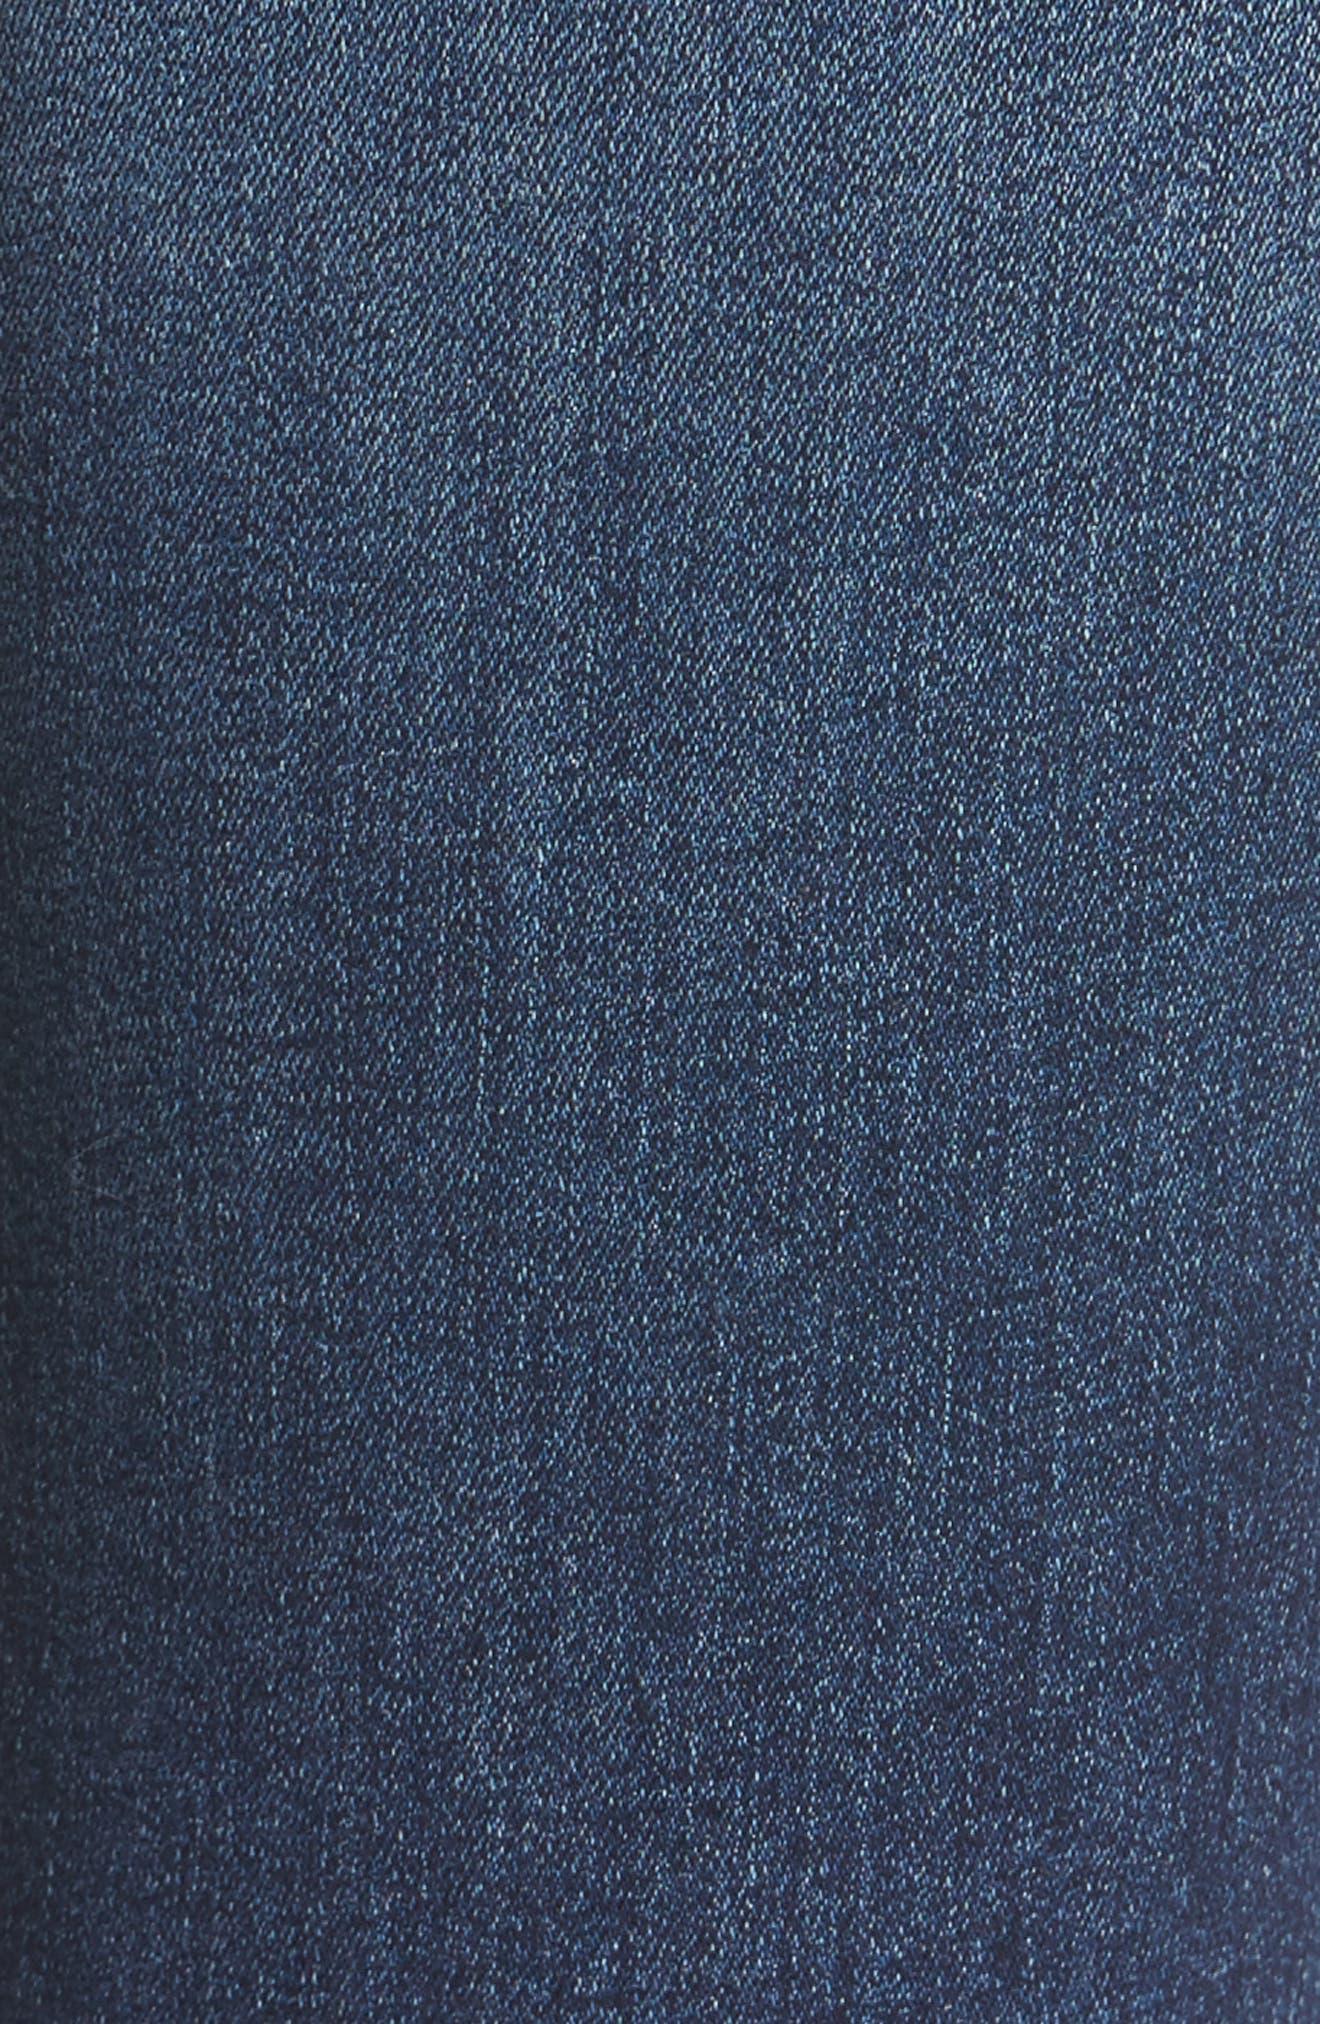 Taylor Tomboy Ripped Boyfriend Jeans,                             Alternate thumbnail 5, color,                             400